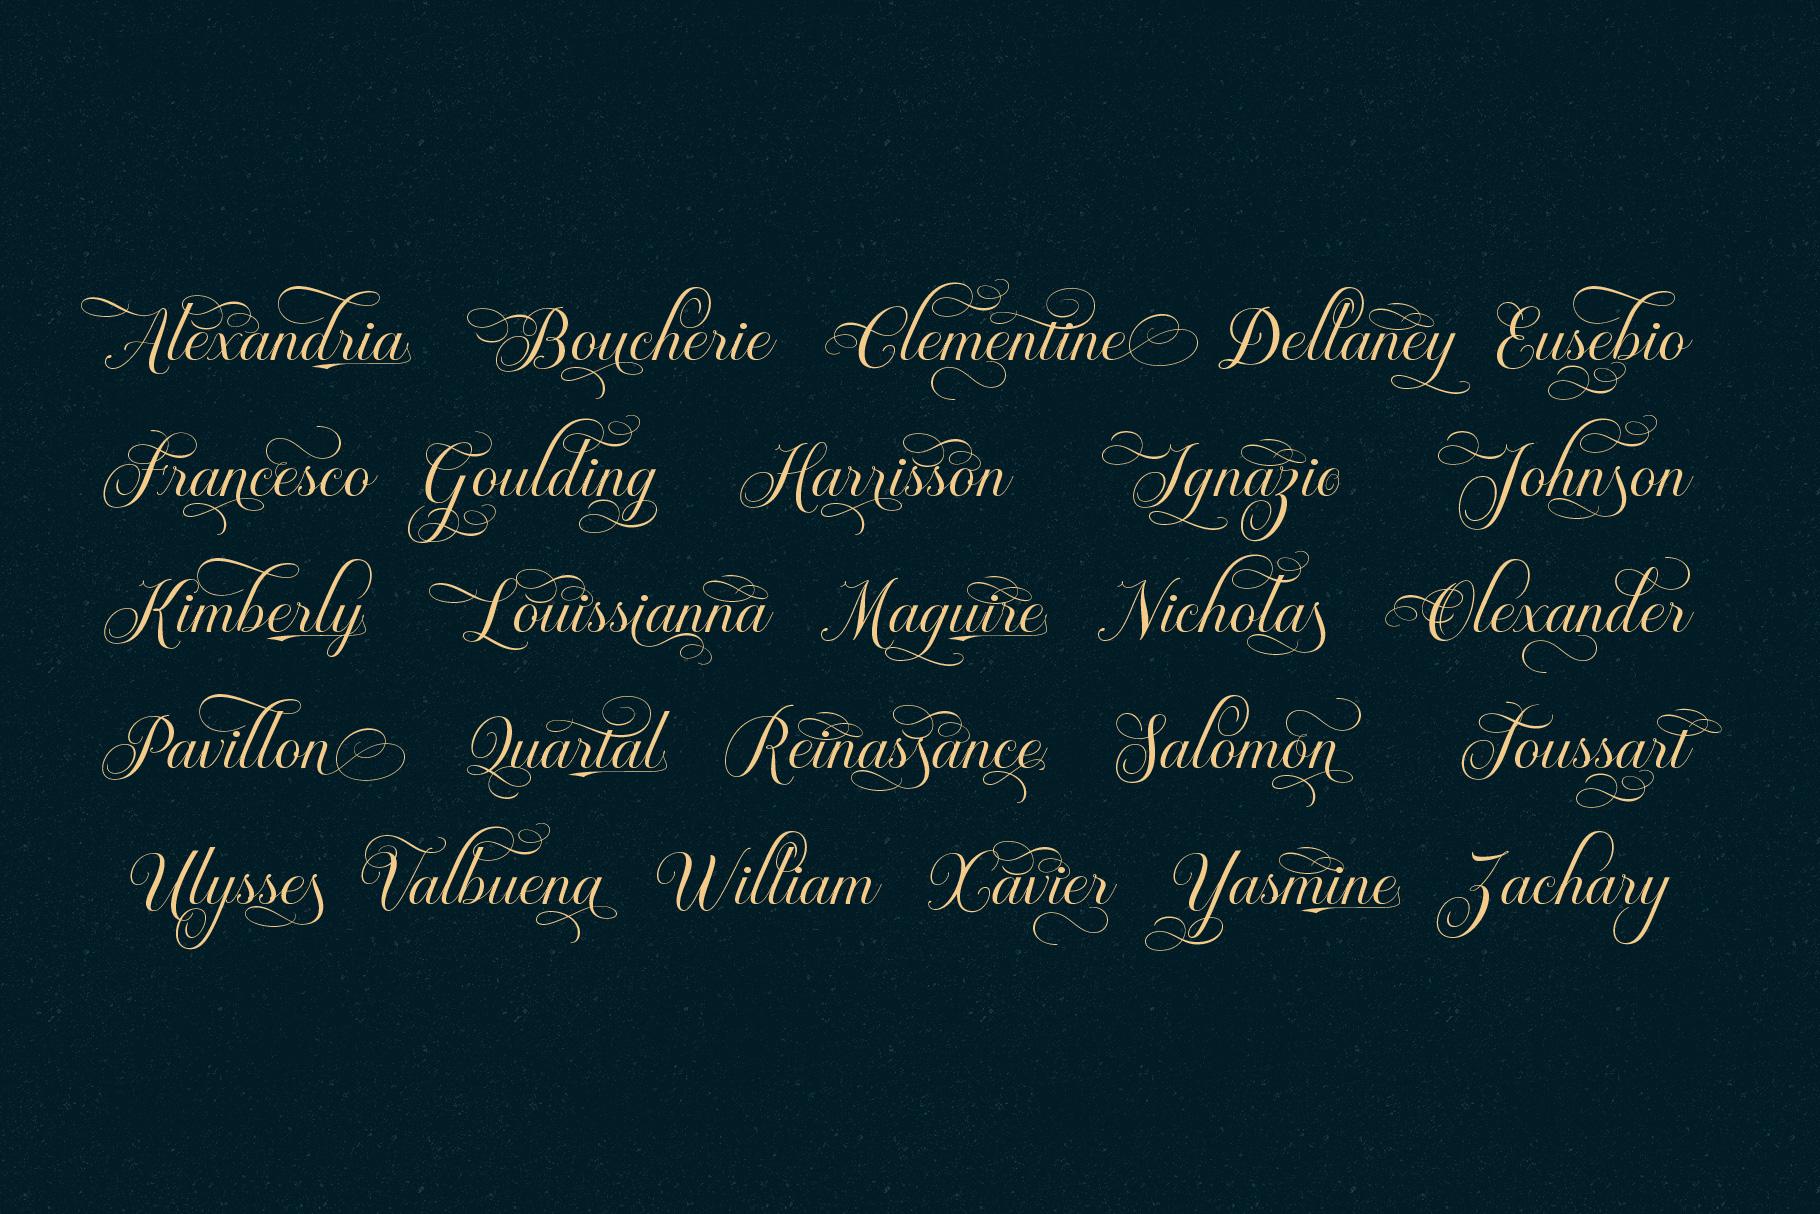 Brignola Elegant Calligraphy example image 7